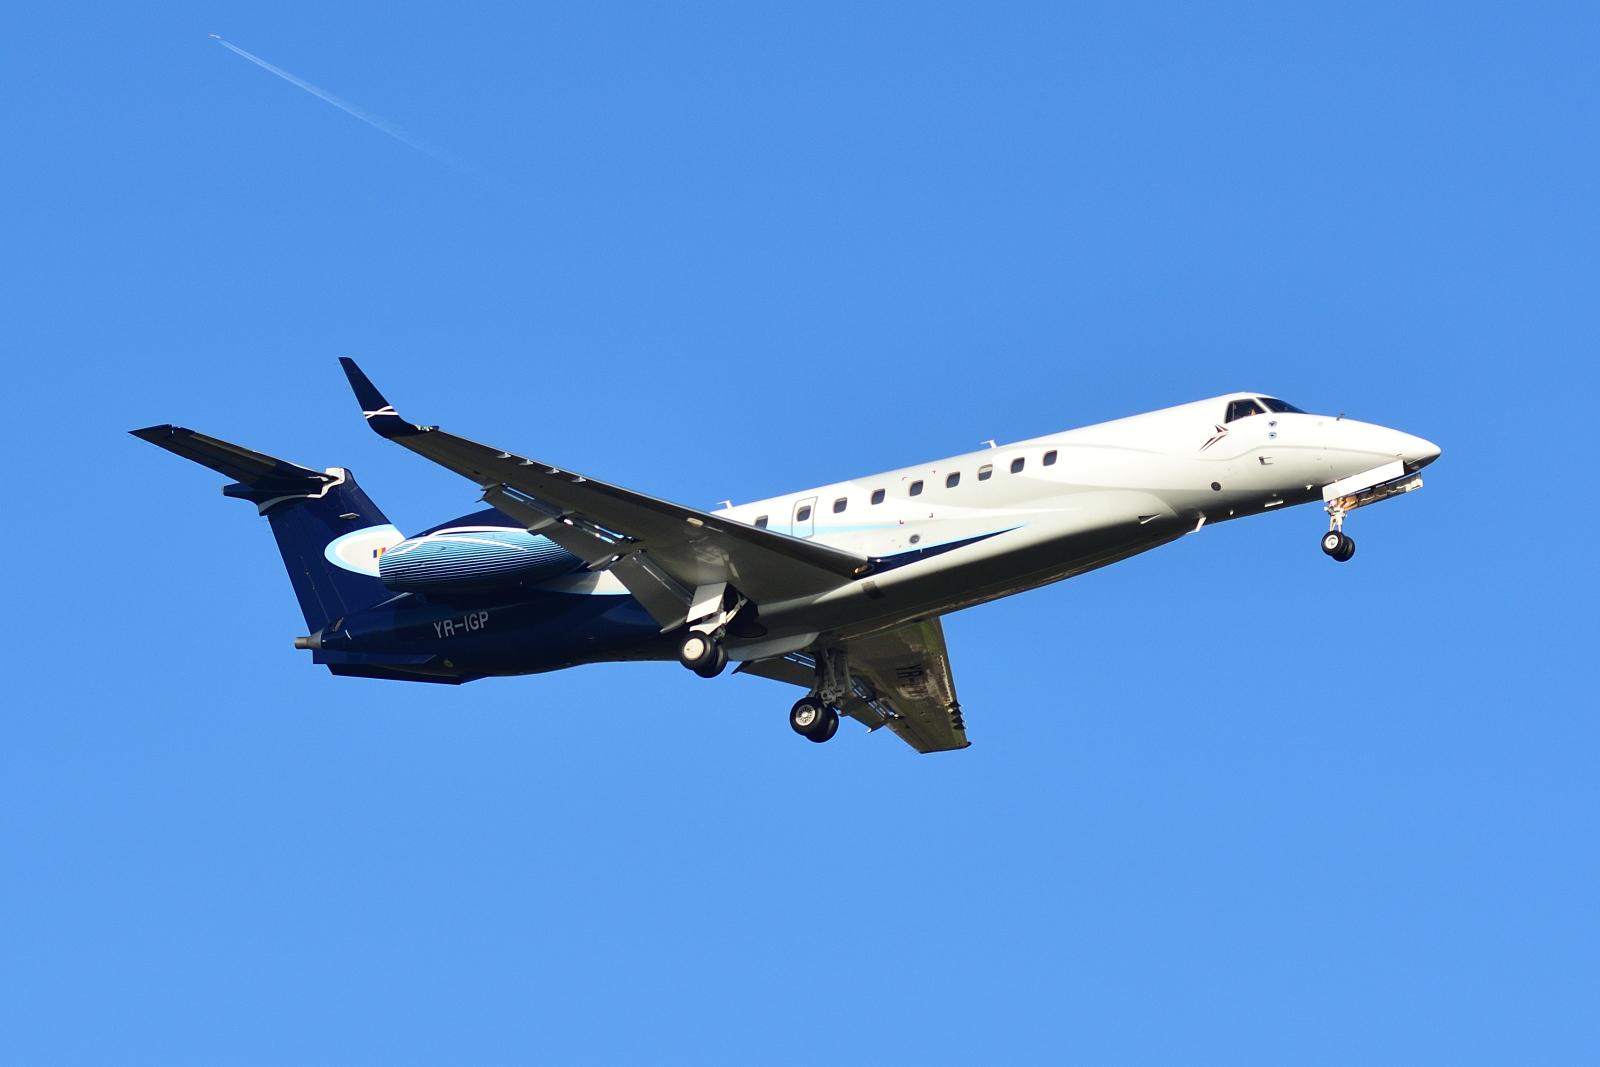 Embraer ERJ-135, YR-IGP